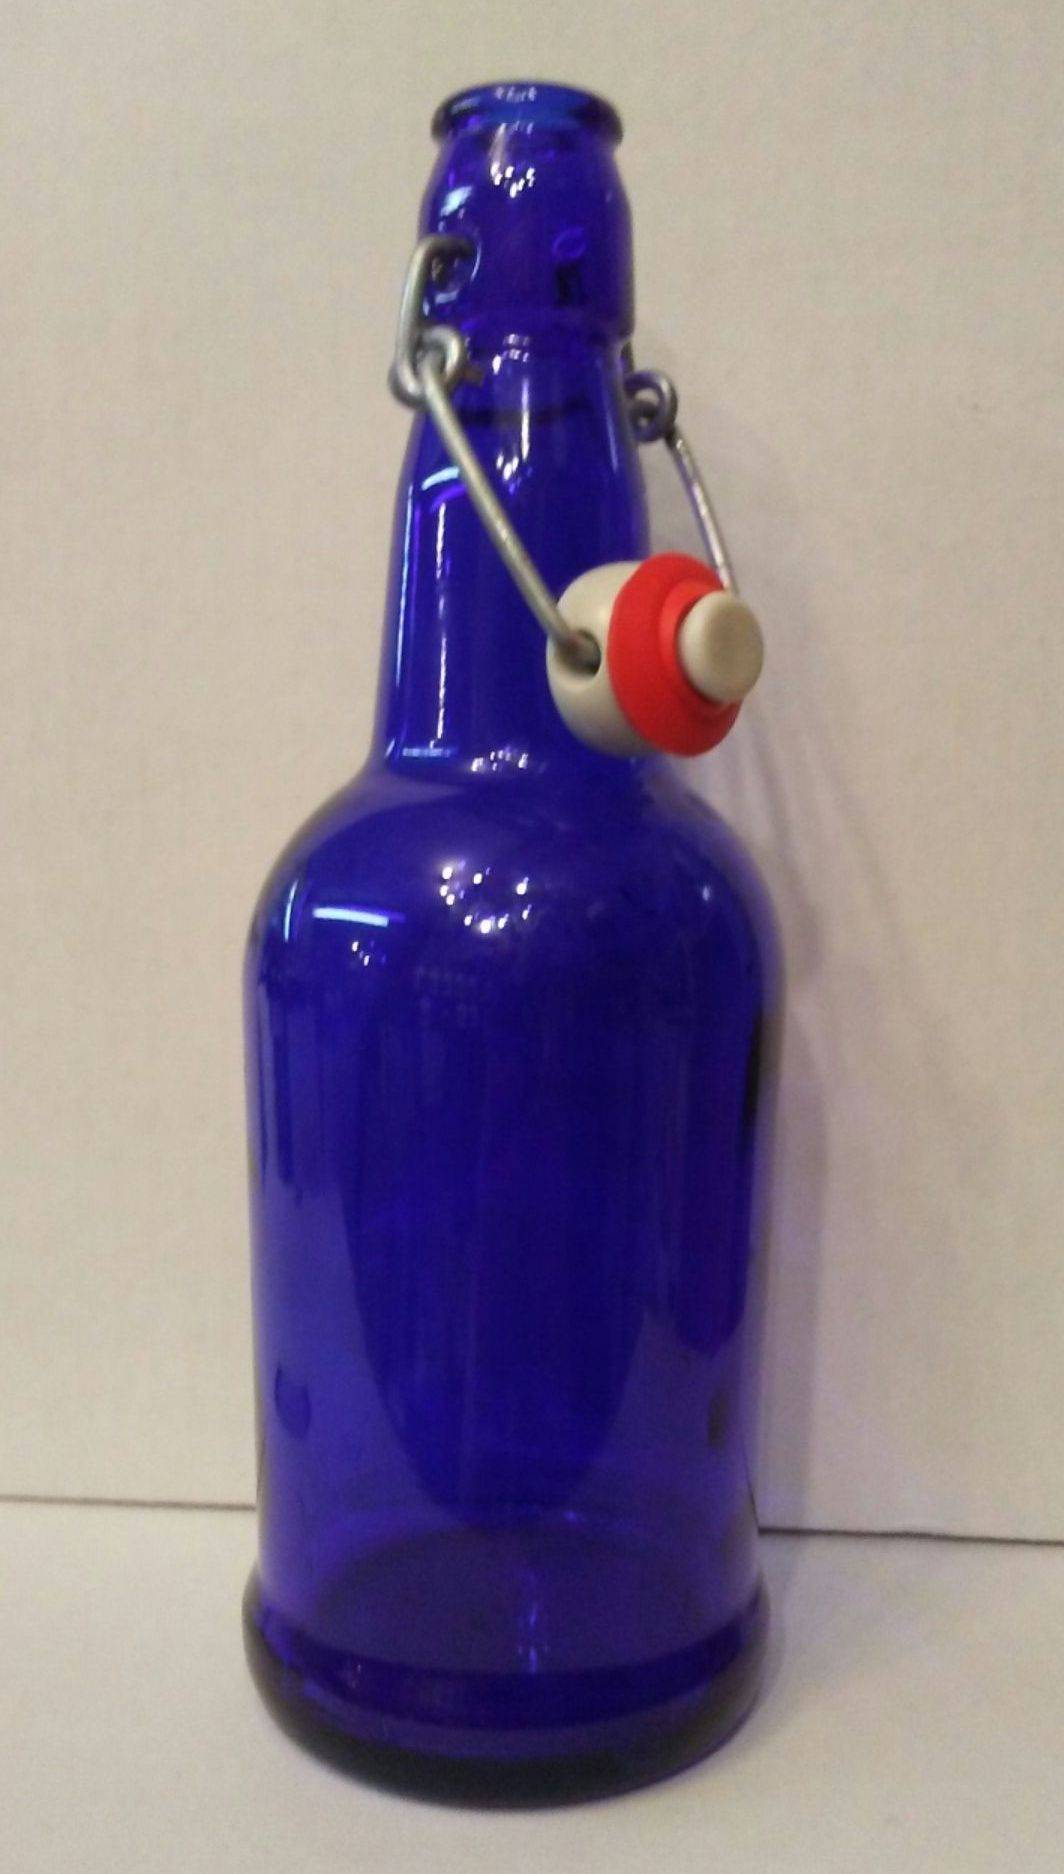 16 oz. Grolsch Bottle Blue